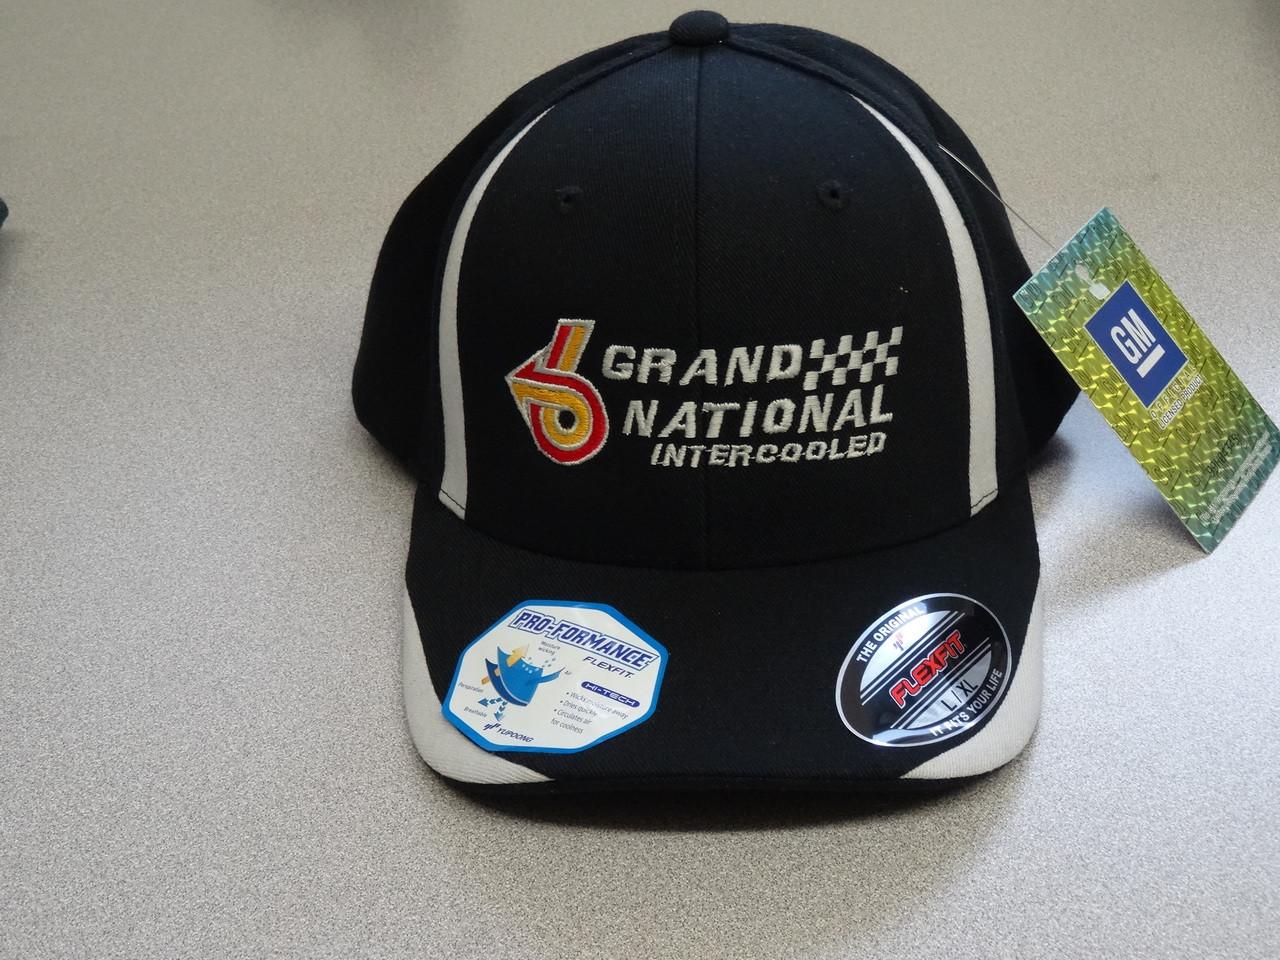 BUICK GRAND NATIONAL INTERCOOLED MOISTURE WICKING FLEXFIT HAT ... bef934c0656f